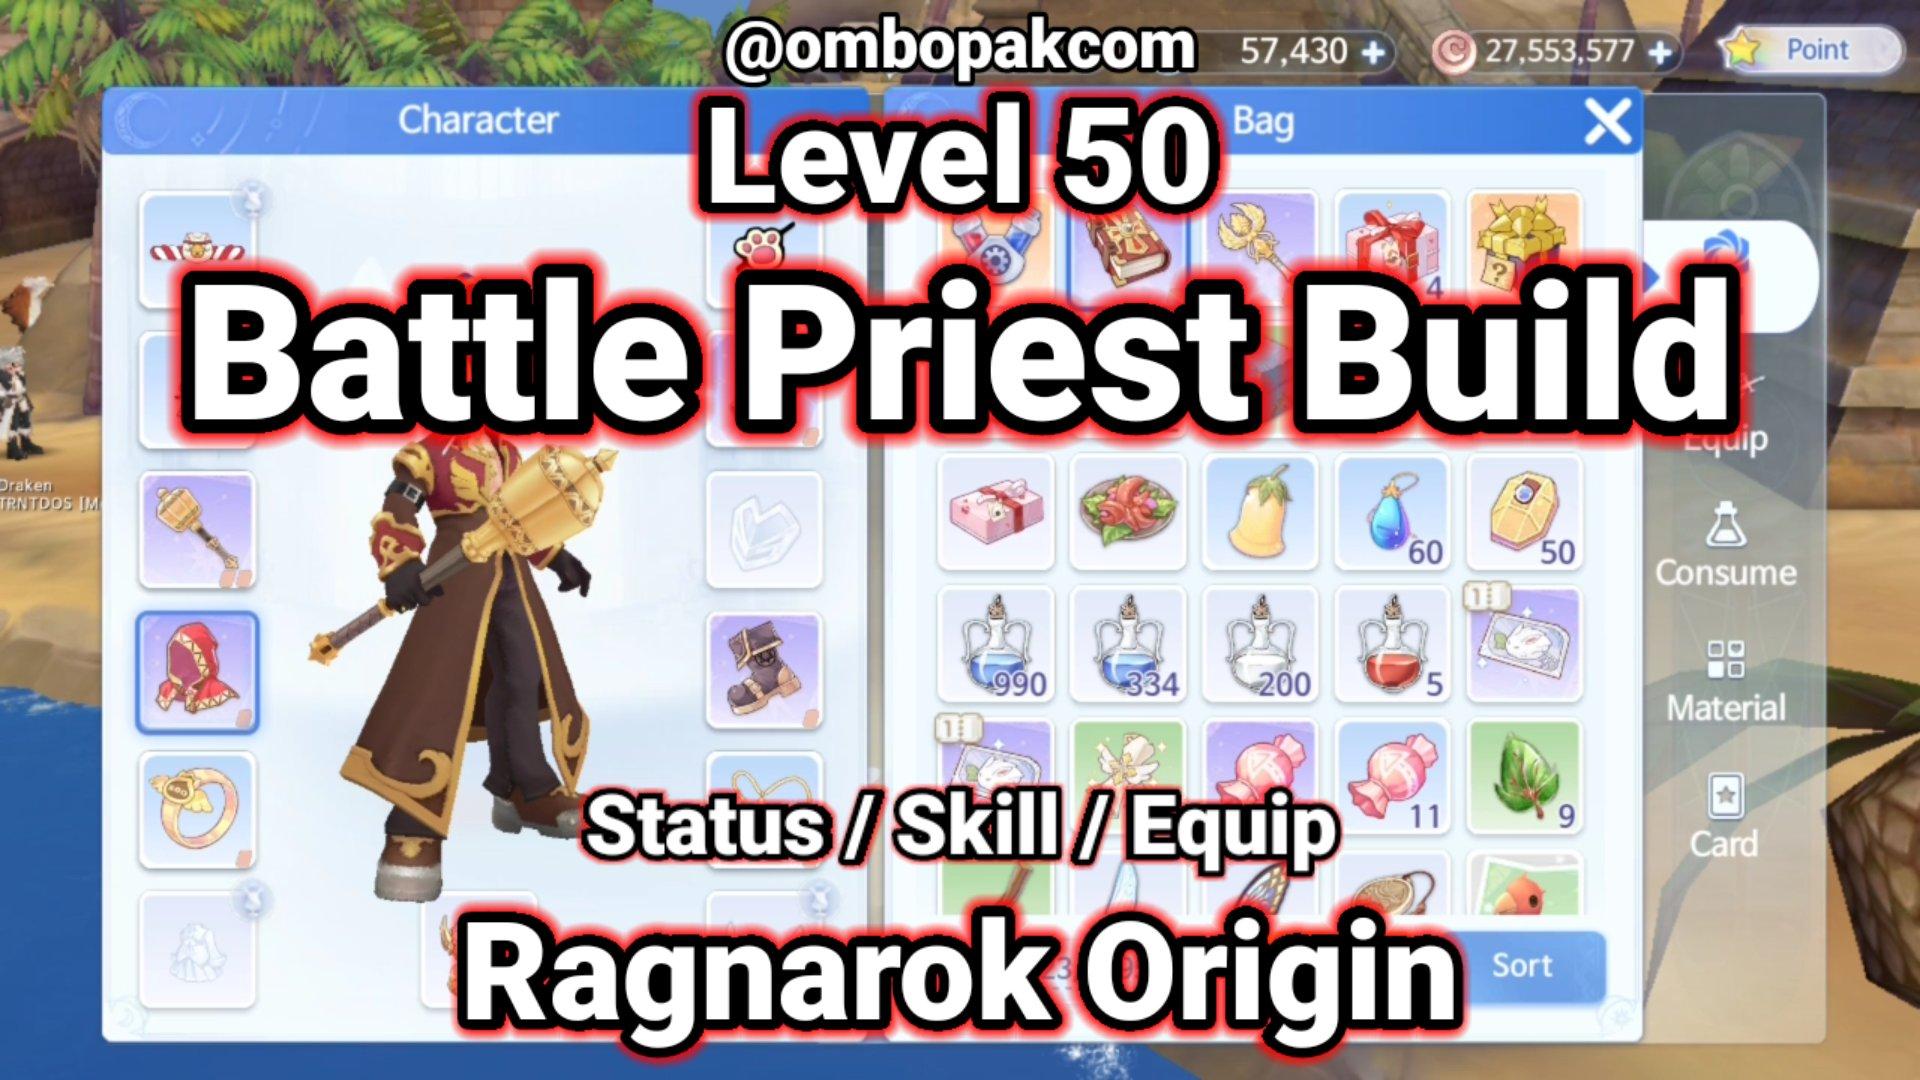 Level 50 Battle Priest Build Ragnarok Origin ラグオリ | 라그나로크 오리진 1